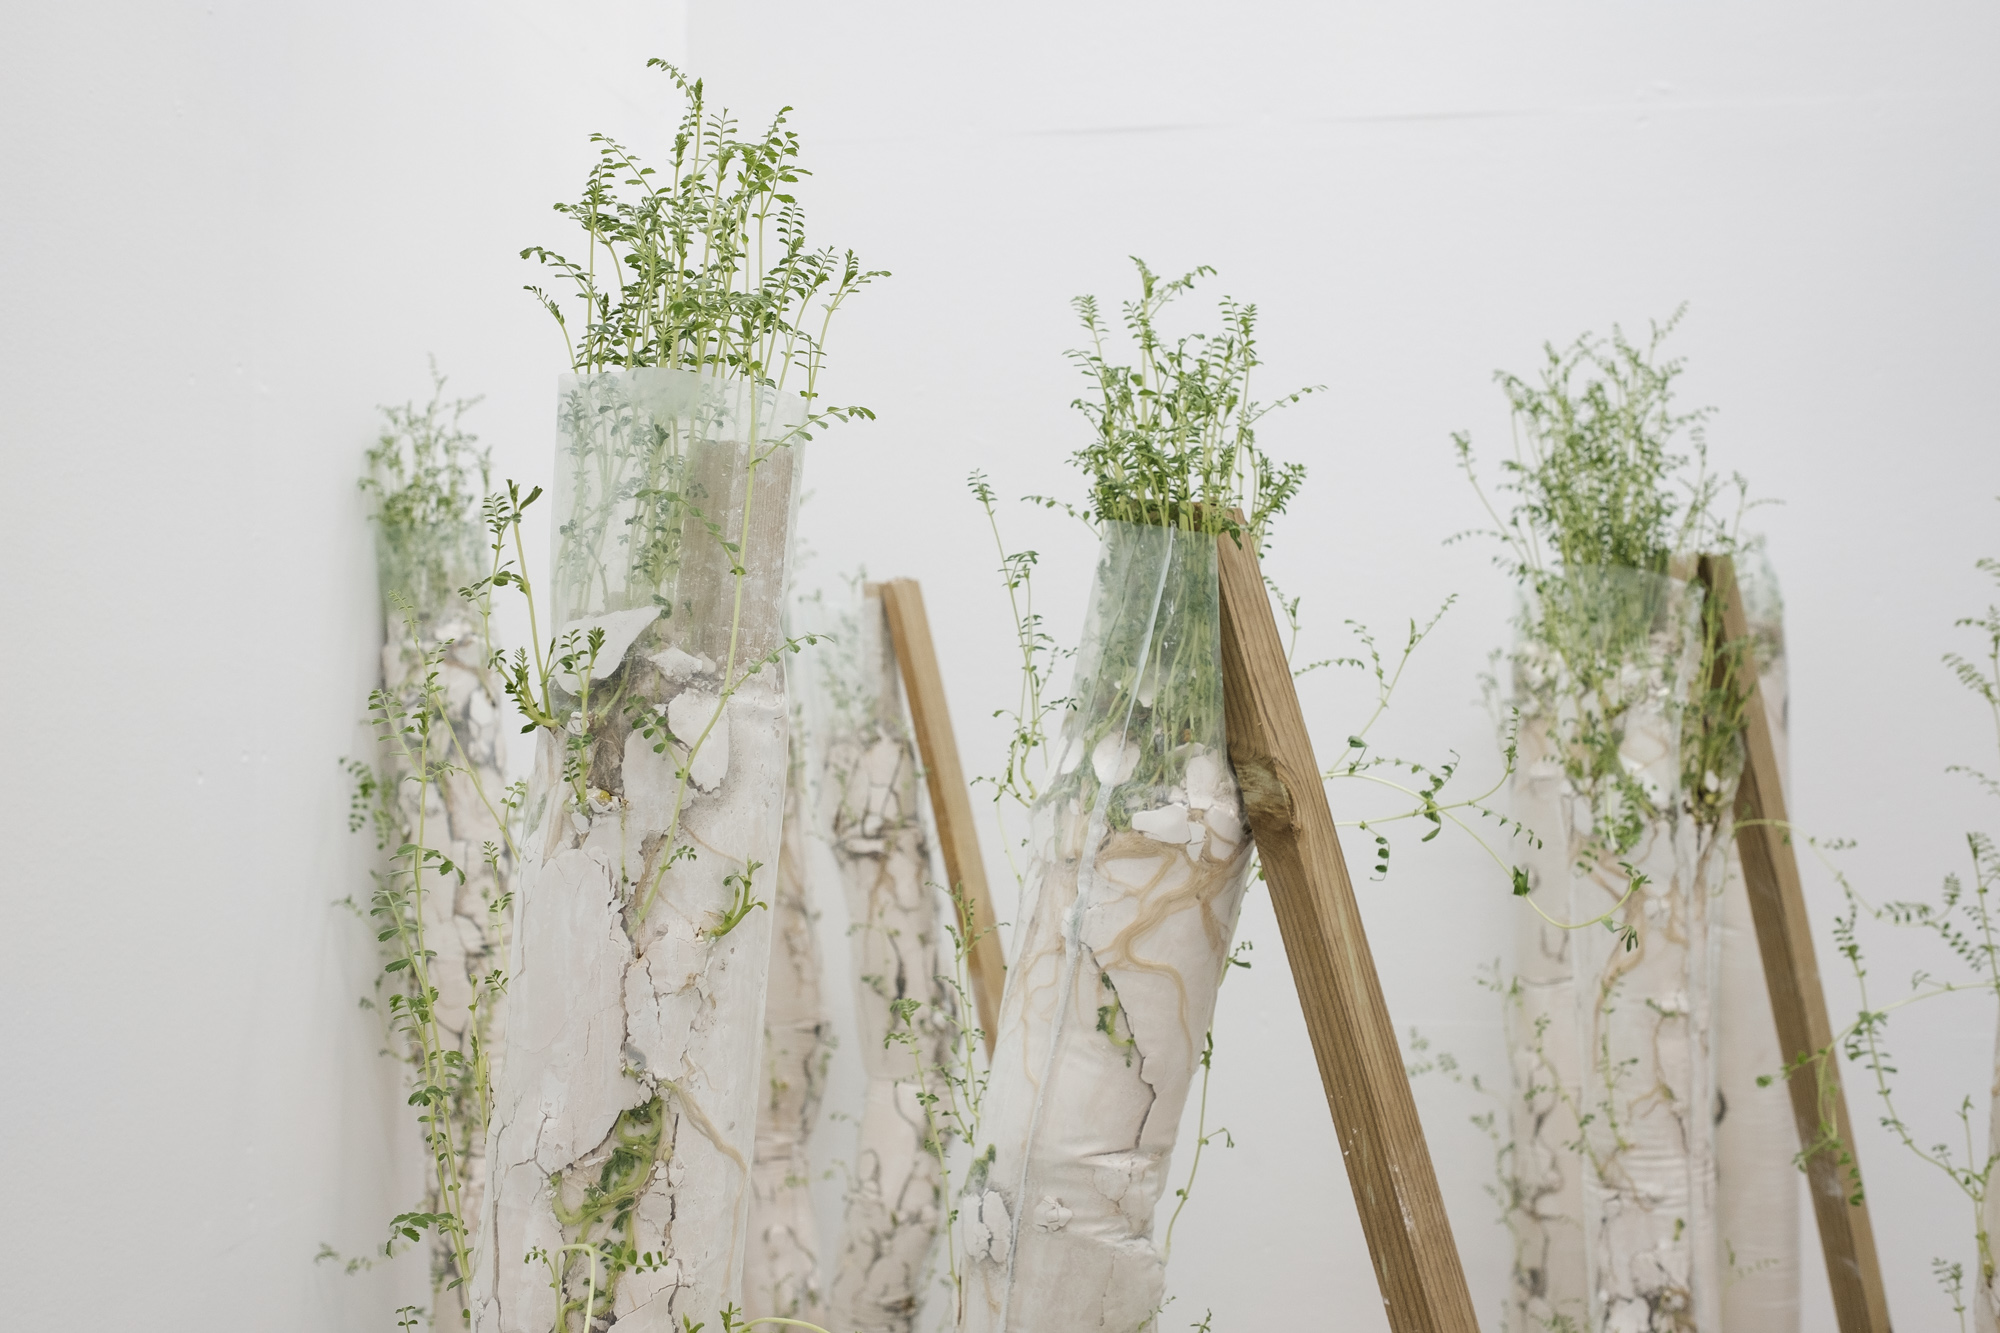 Ramona Zoladek's winning installation in the Elephant x Griffin Art Prize 2018